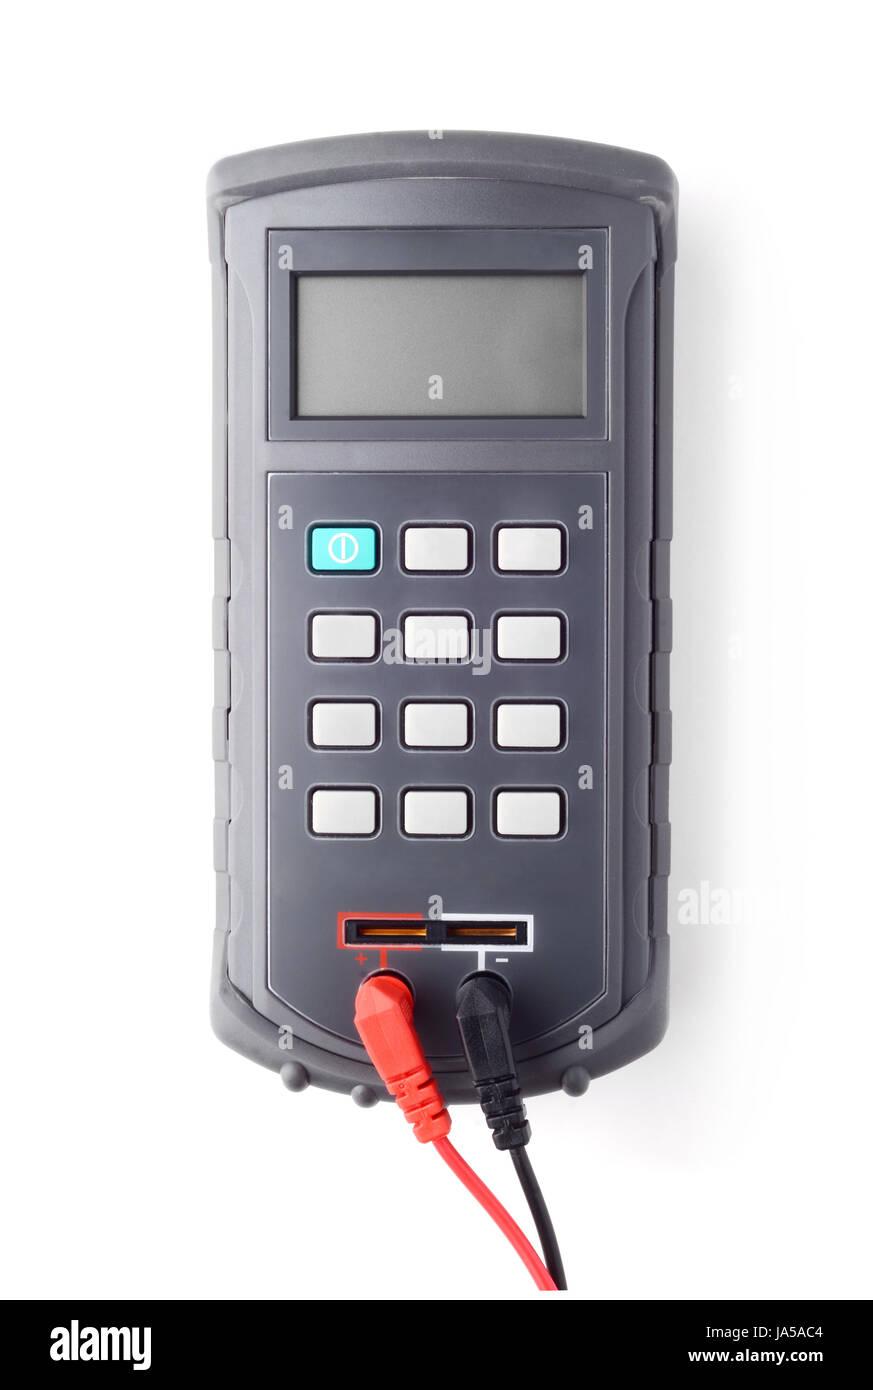 Digital handheld LCR meter top view - Stock Image